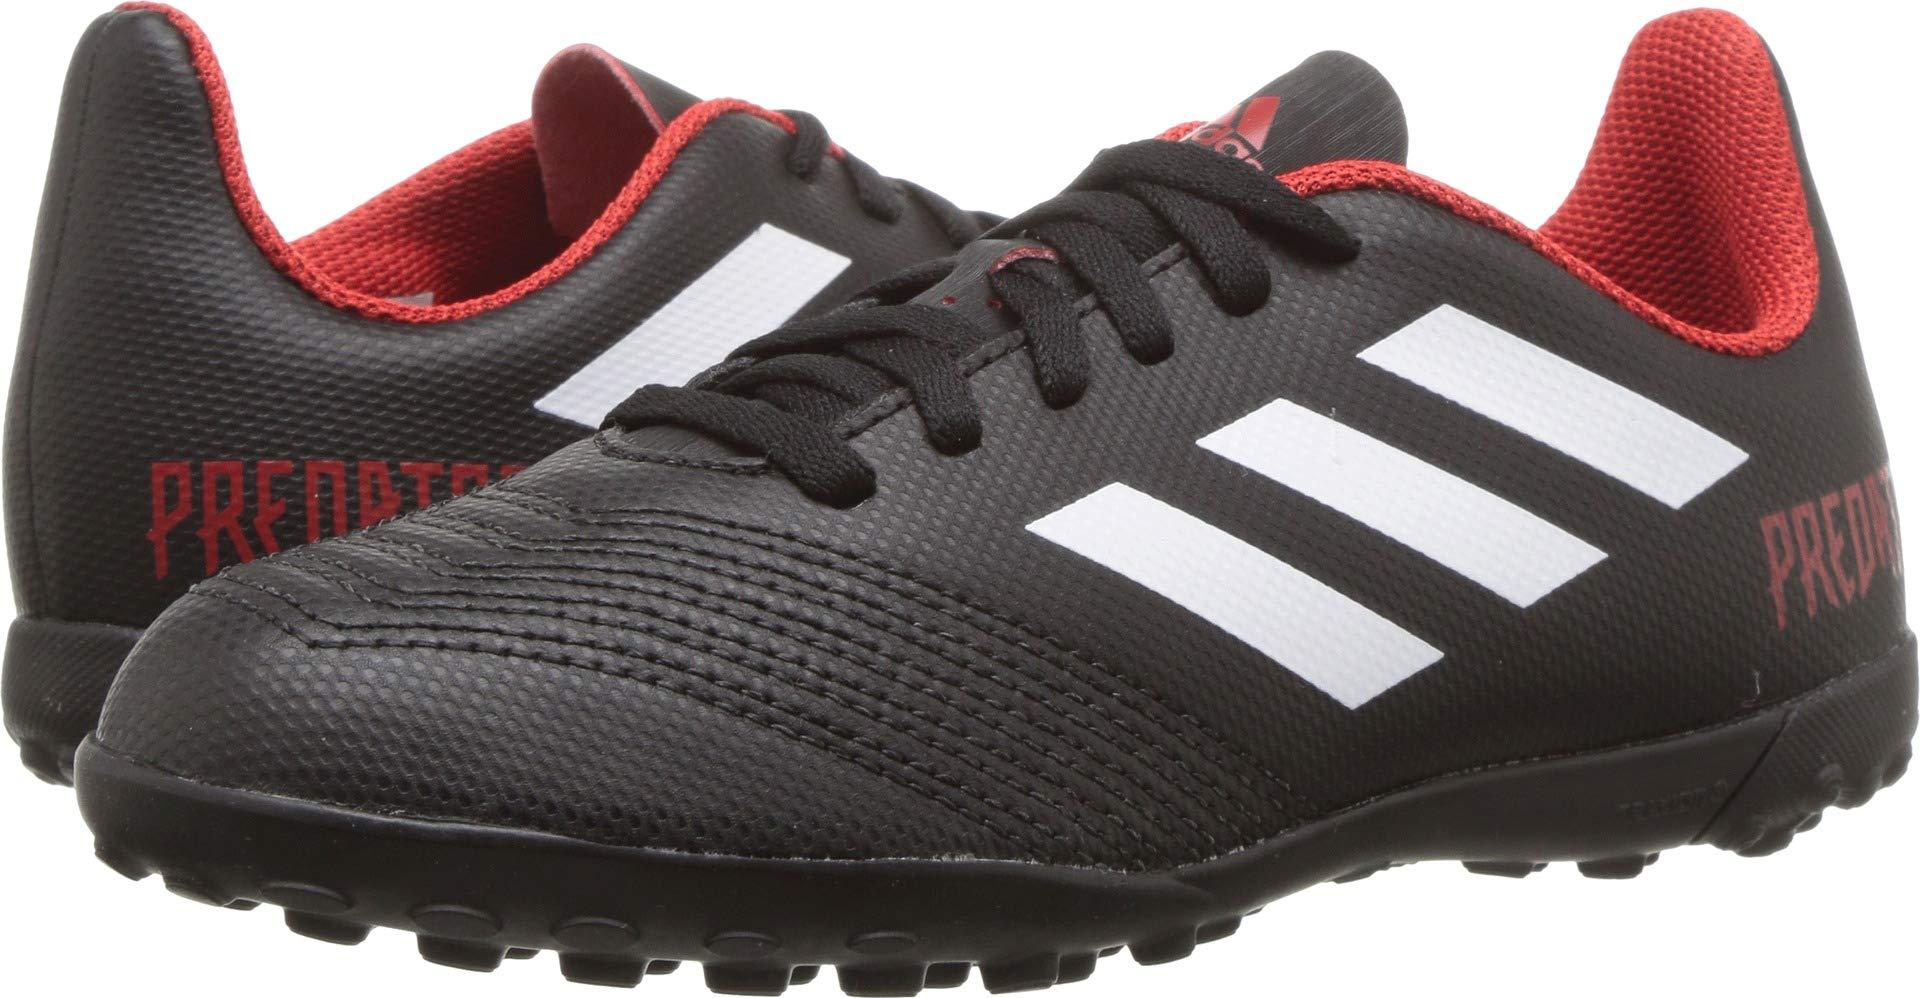 adidas Unisex-Kids Predator Tango 18.4 Turf Soccer Shoe, Black/White/Red, 4 M US Big Kid